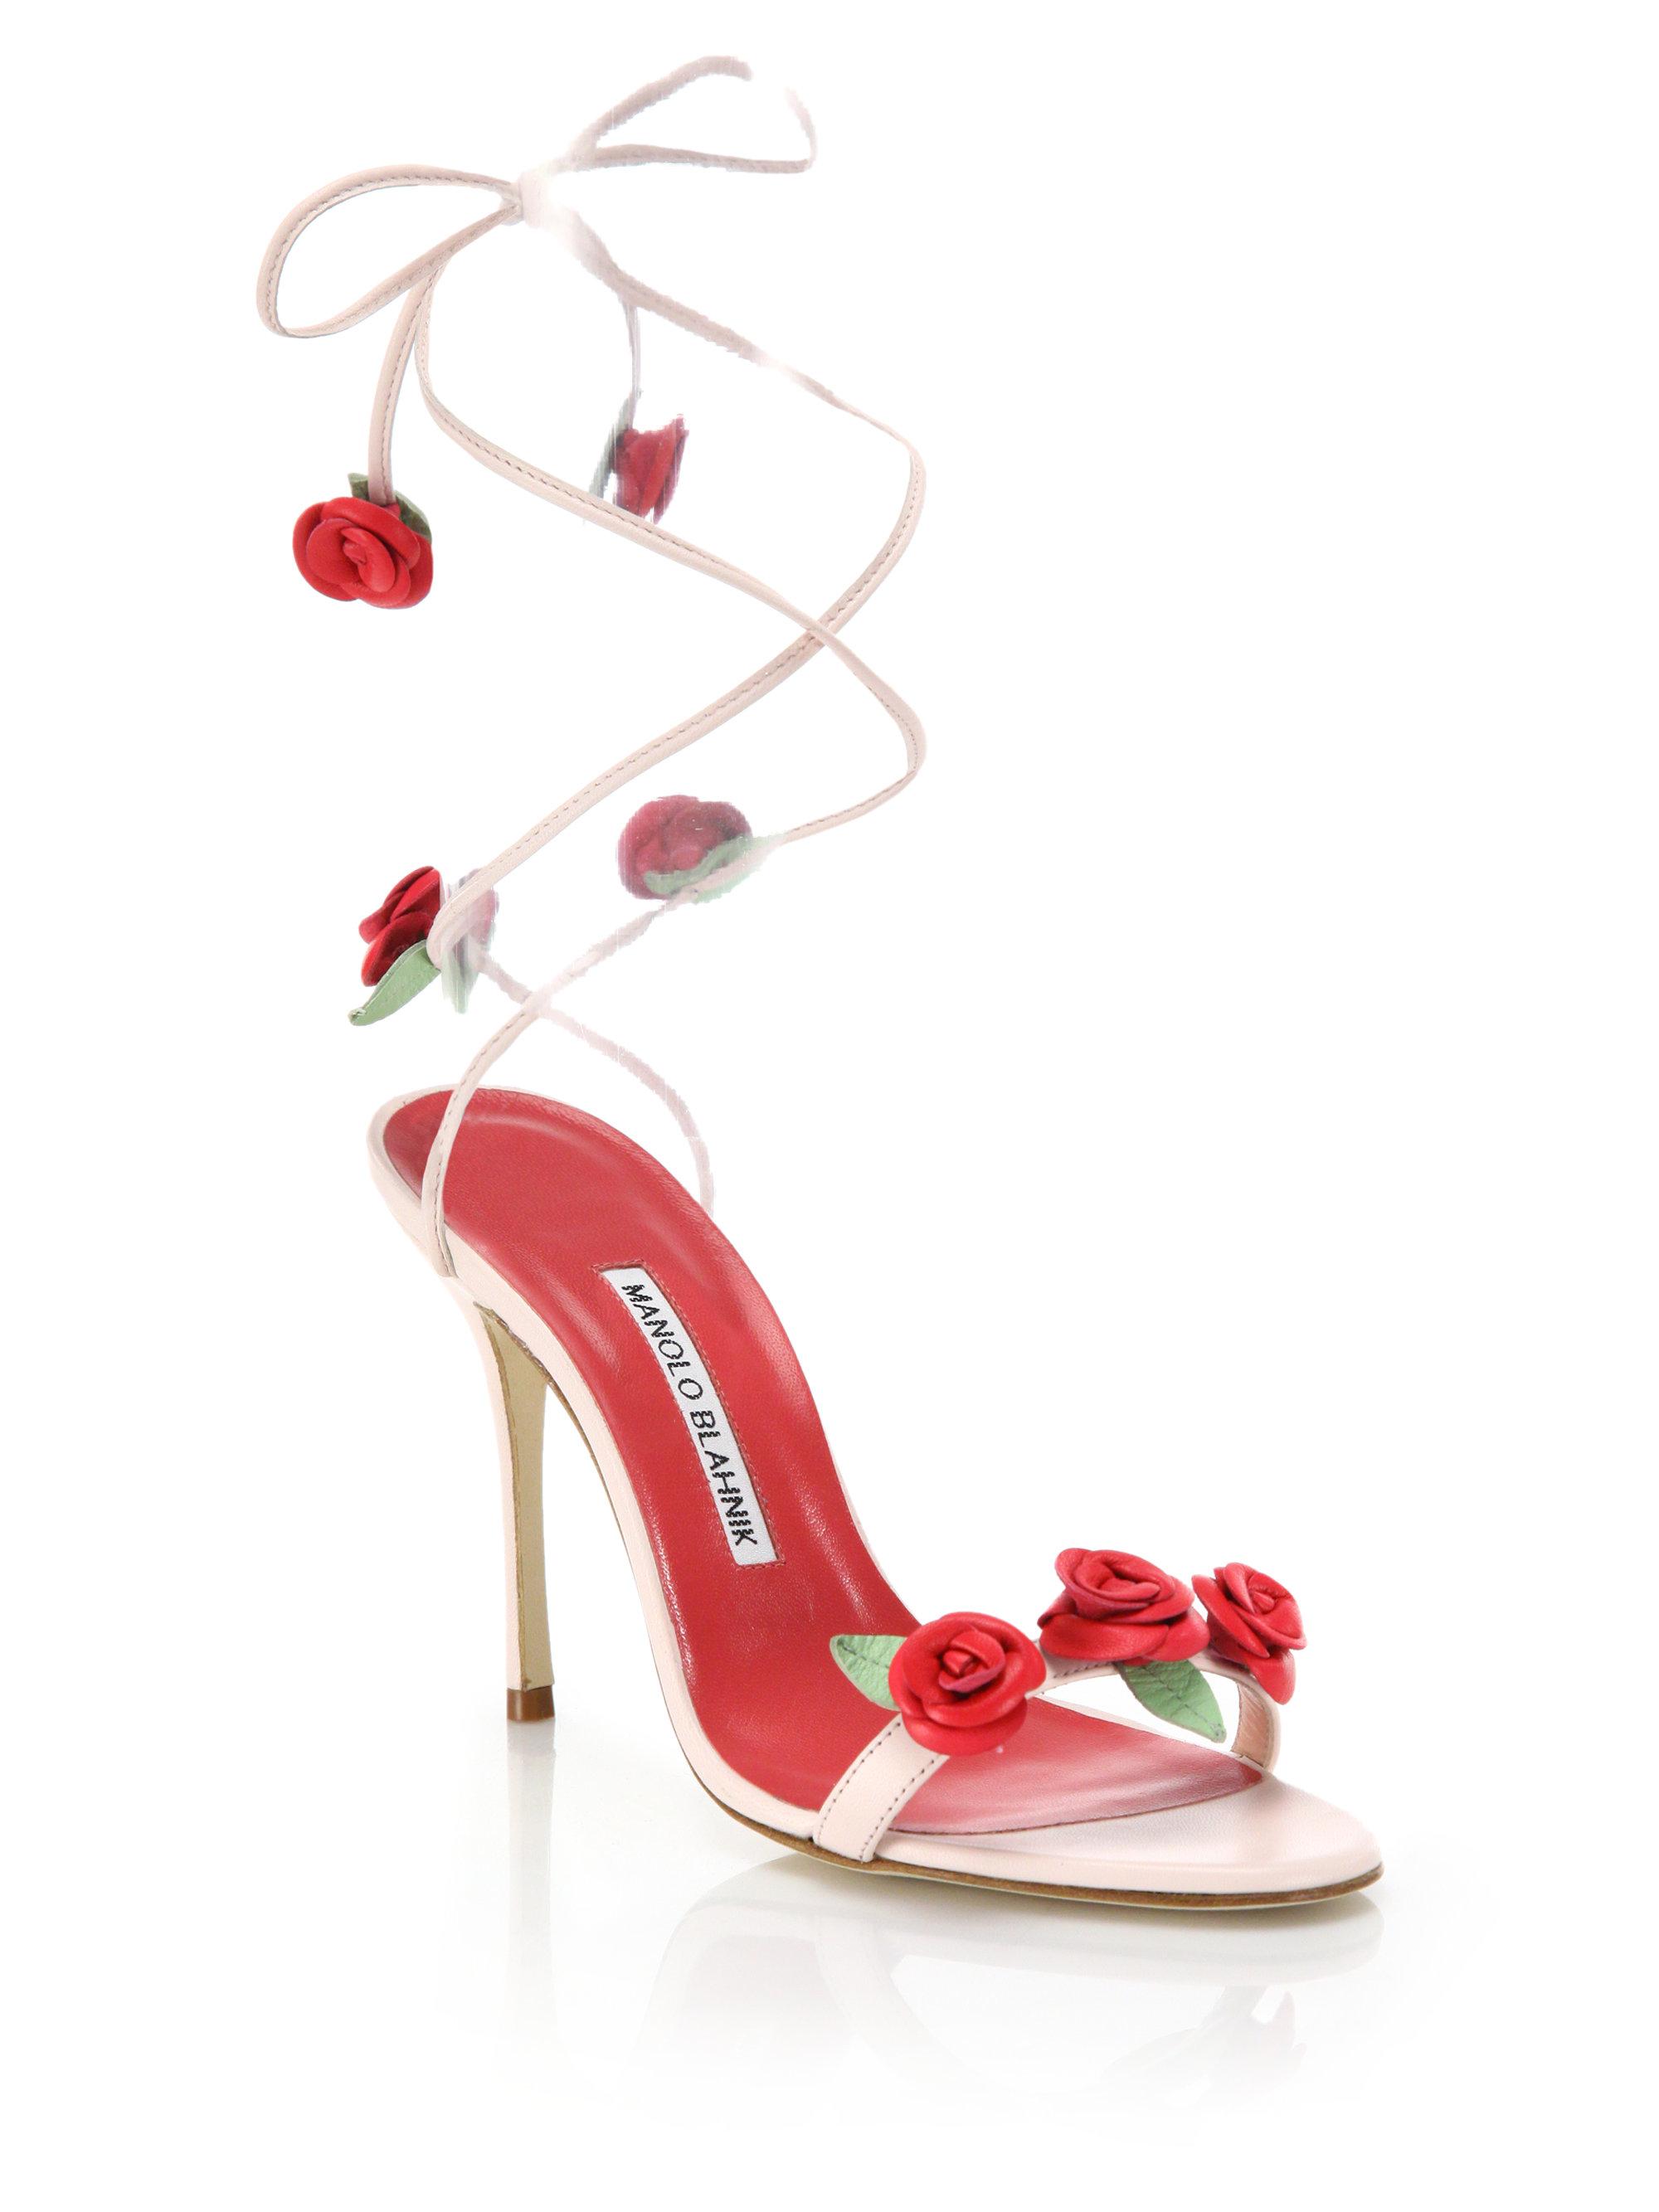 b3185e08d0db Lyst - Manolo Blahnik Leather Rose-detail Lace-up Sandals